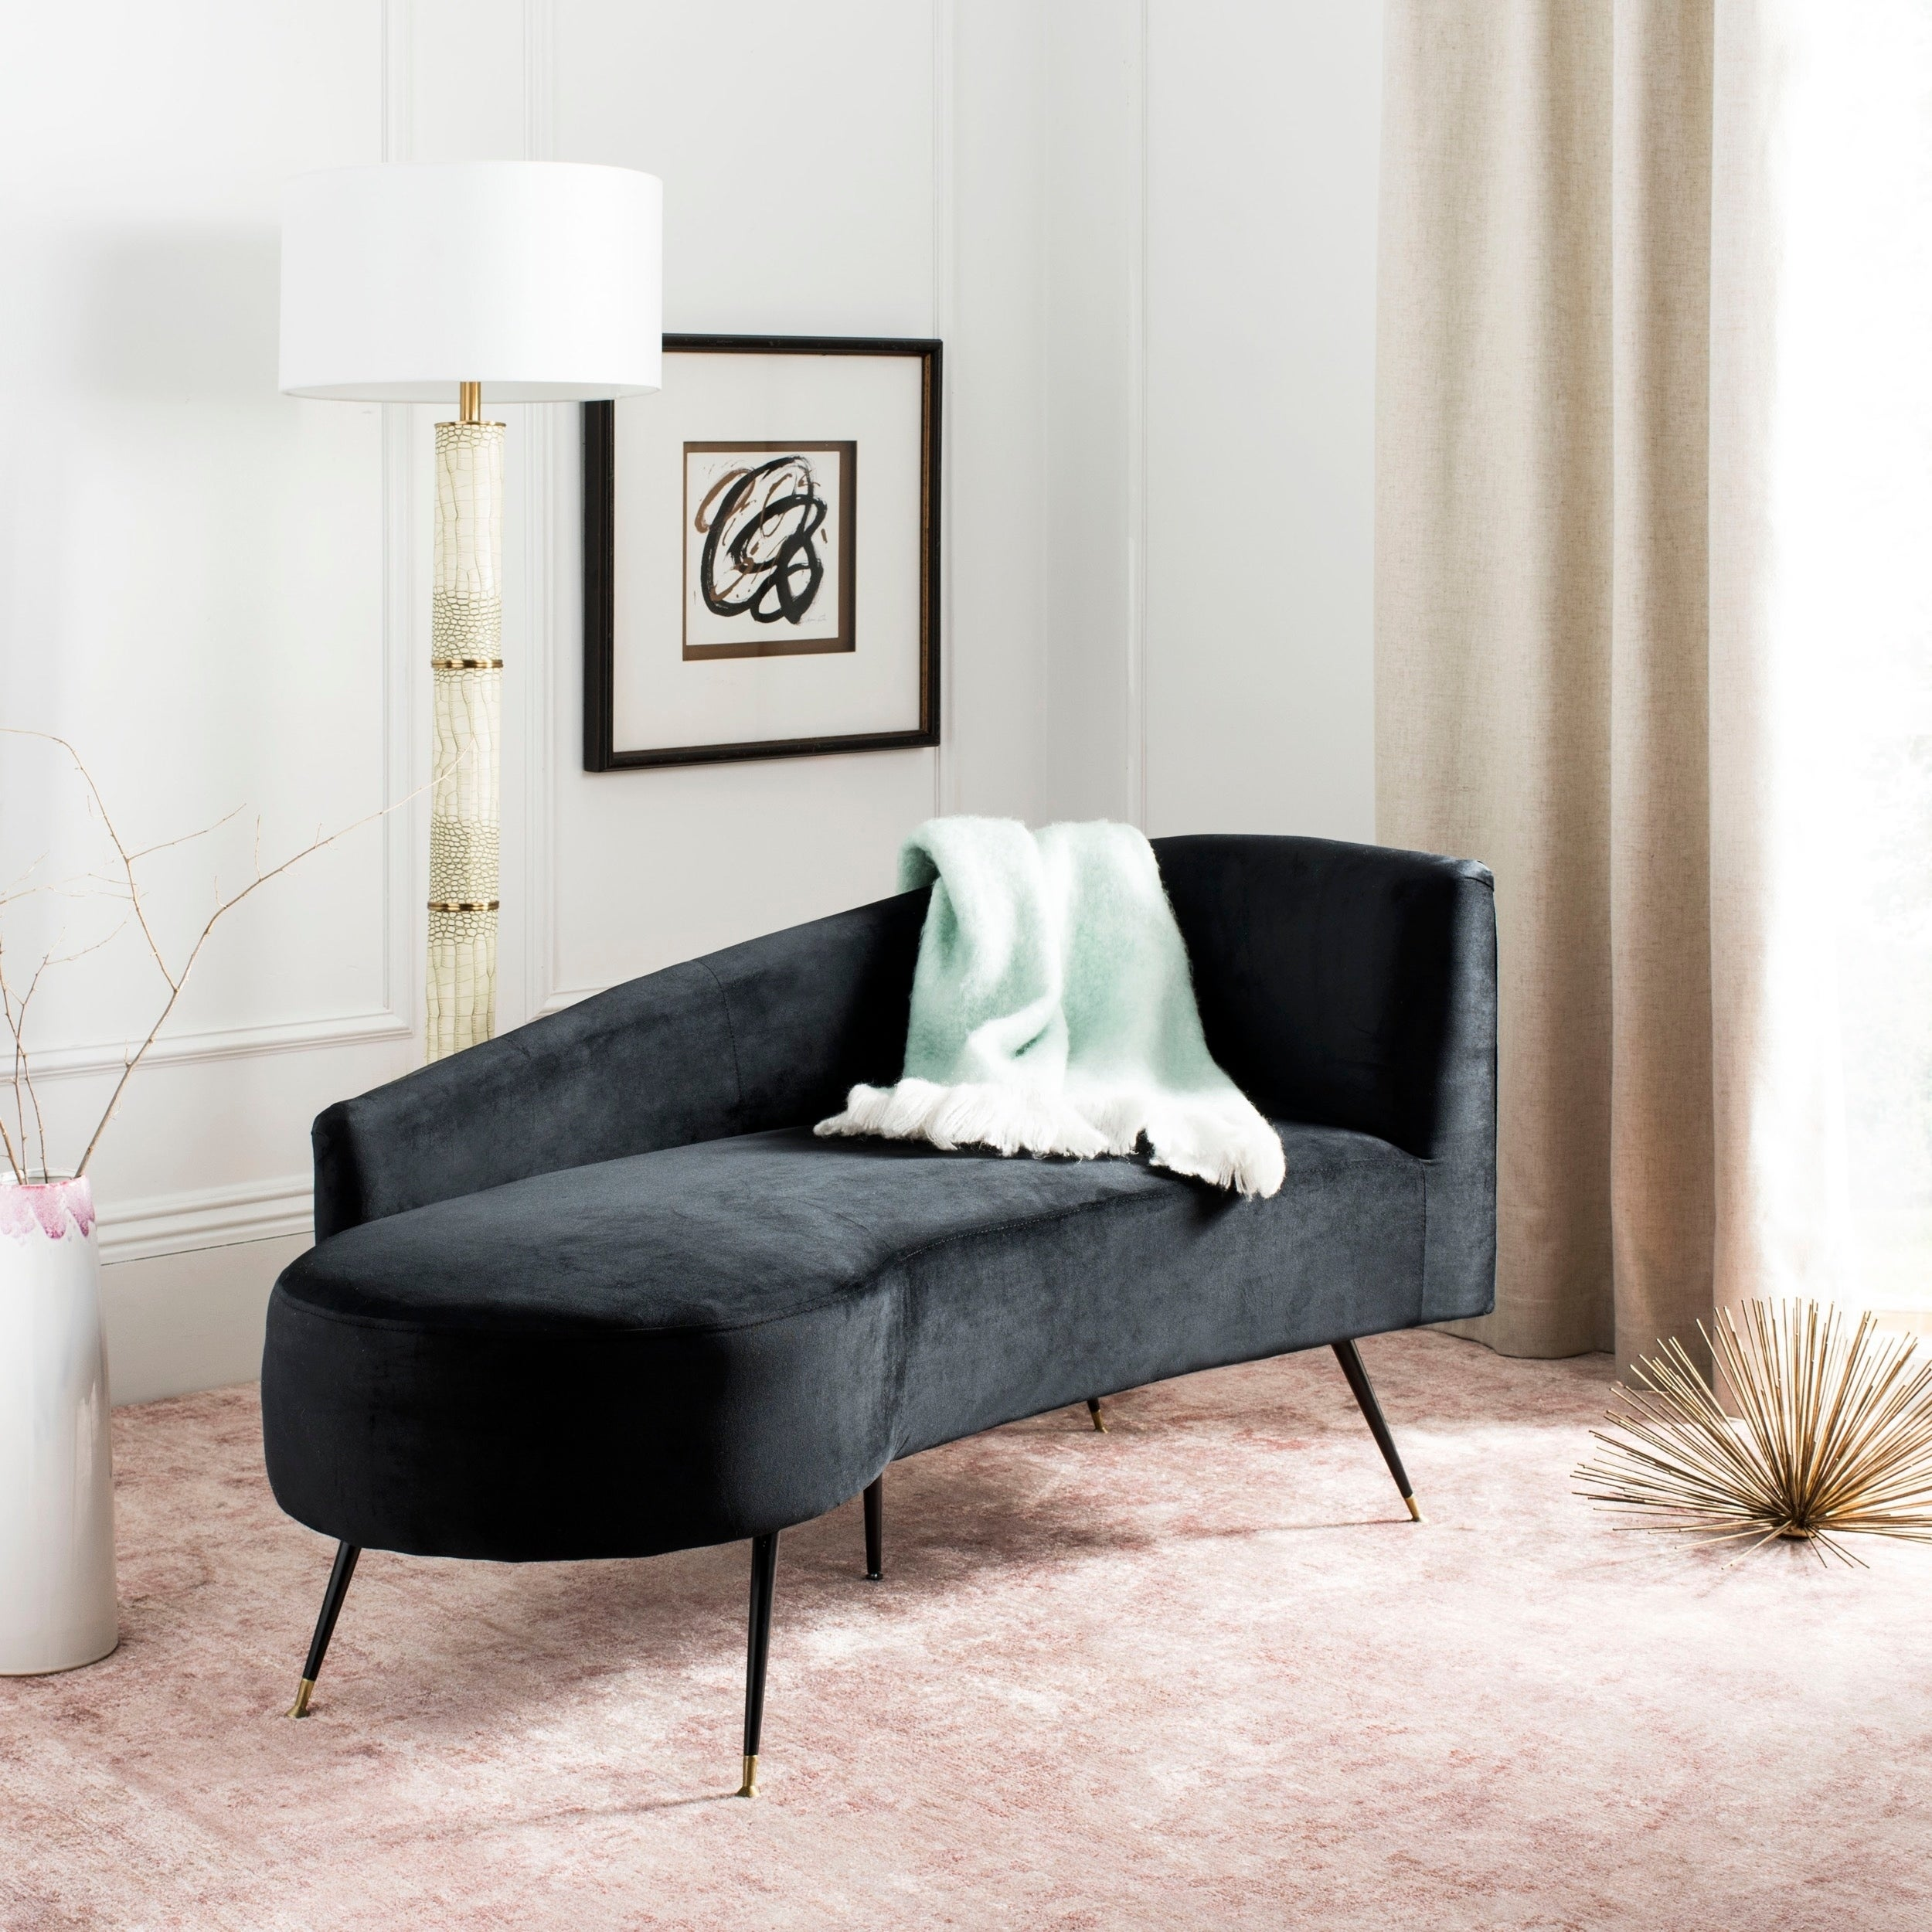 Outstanding Safavieh Ezra Black Gold Settee 57 5 X 27 X 28 Beatyapartments Chair Design Images Beatyapartmentscom